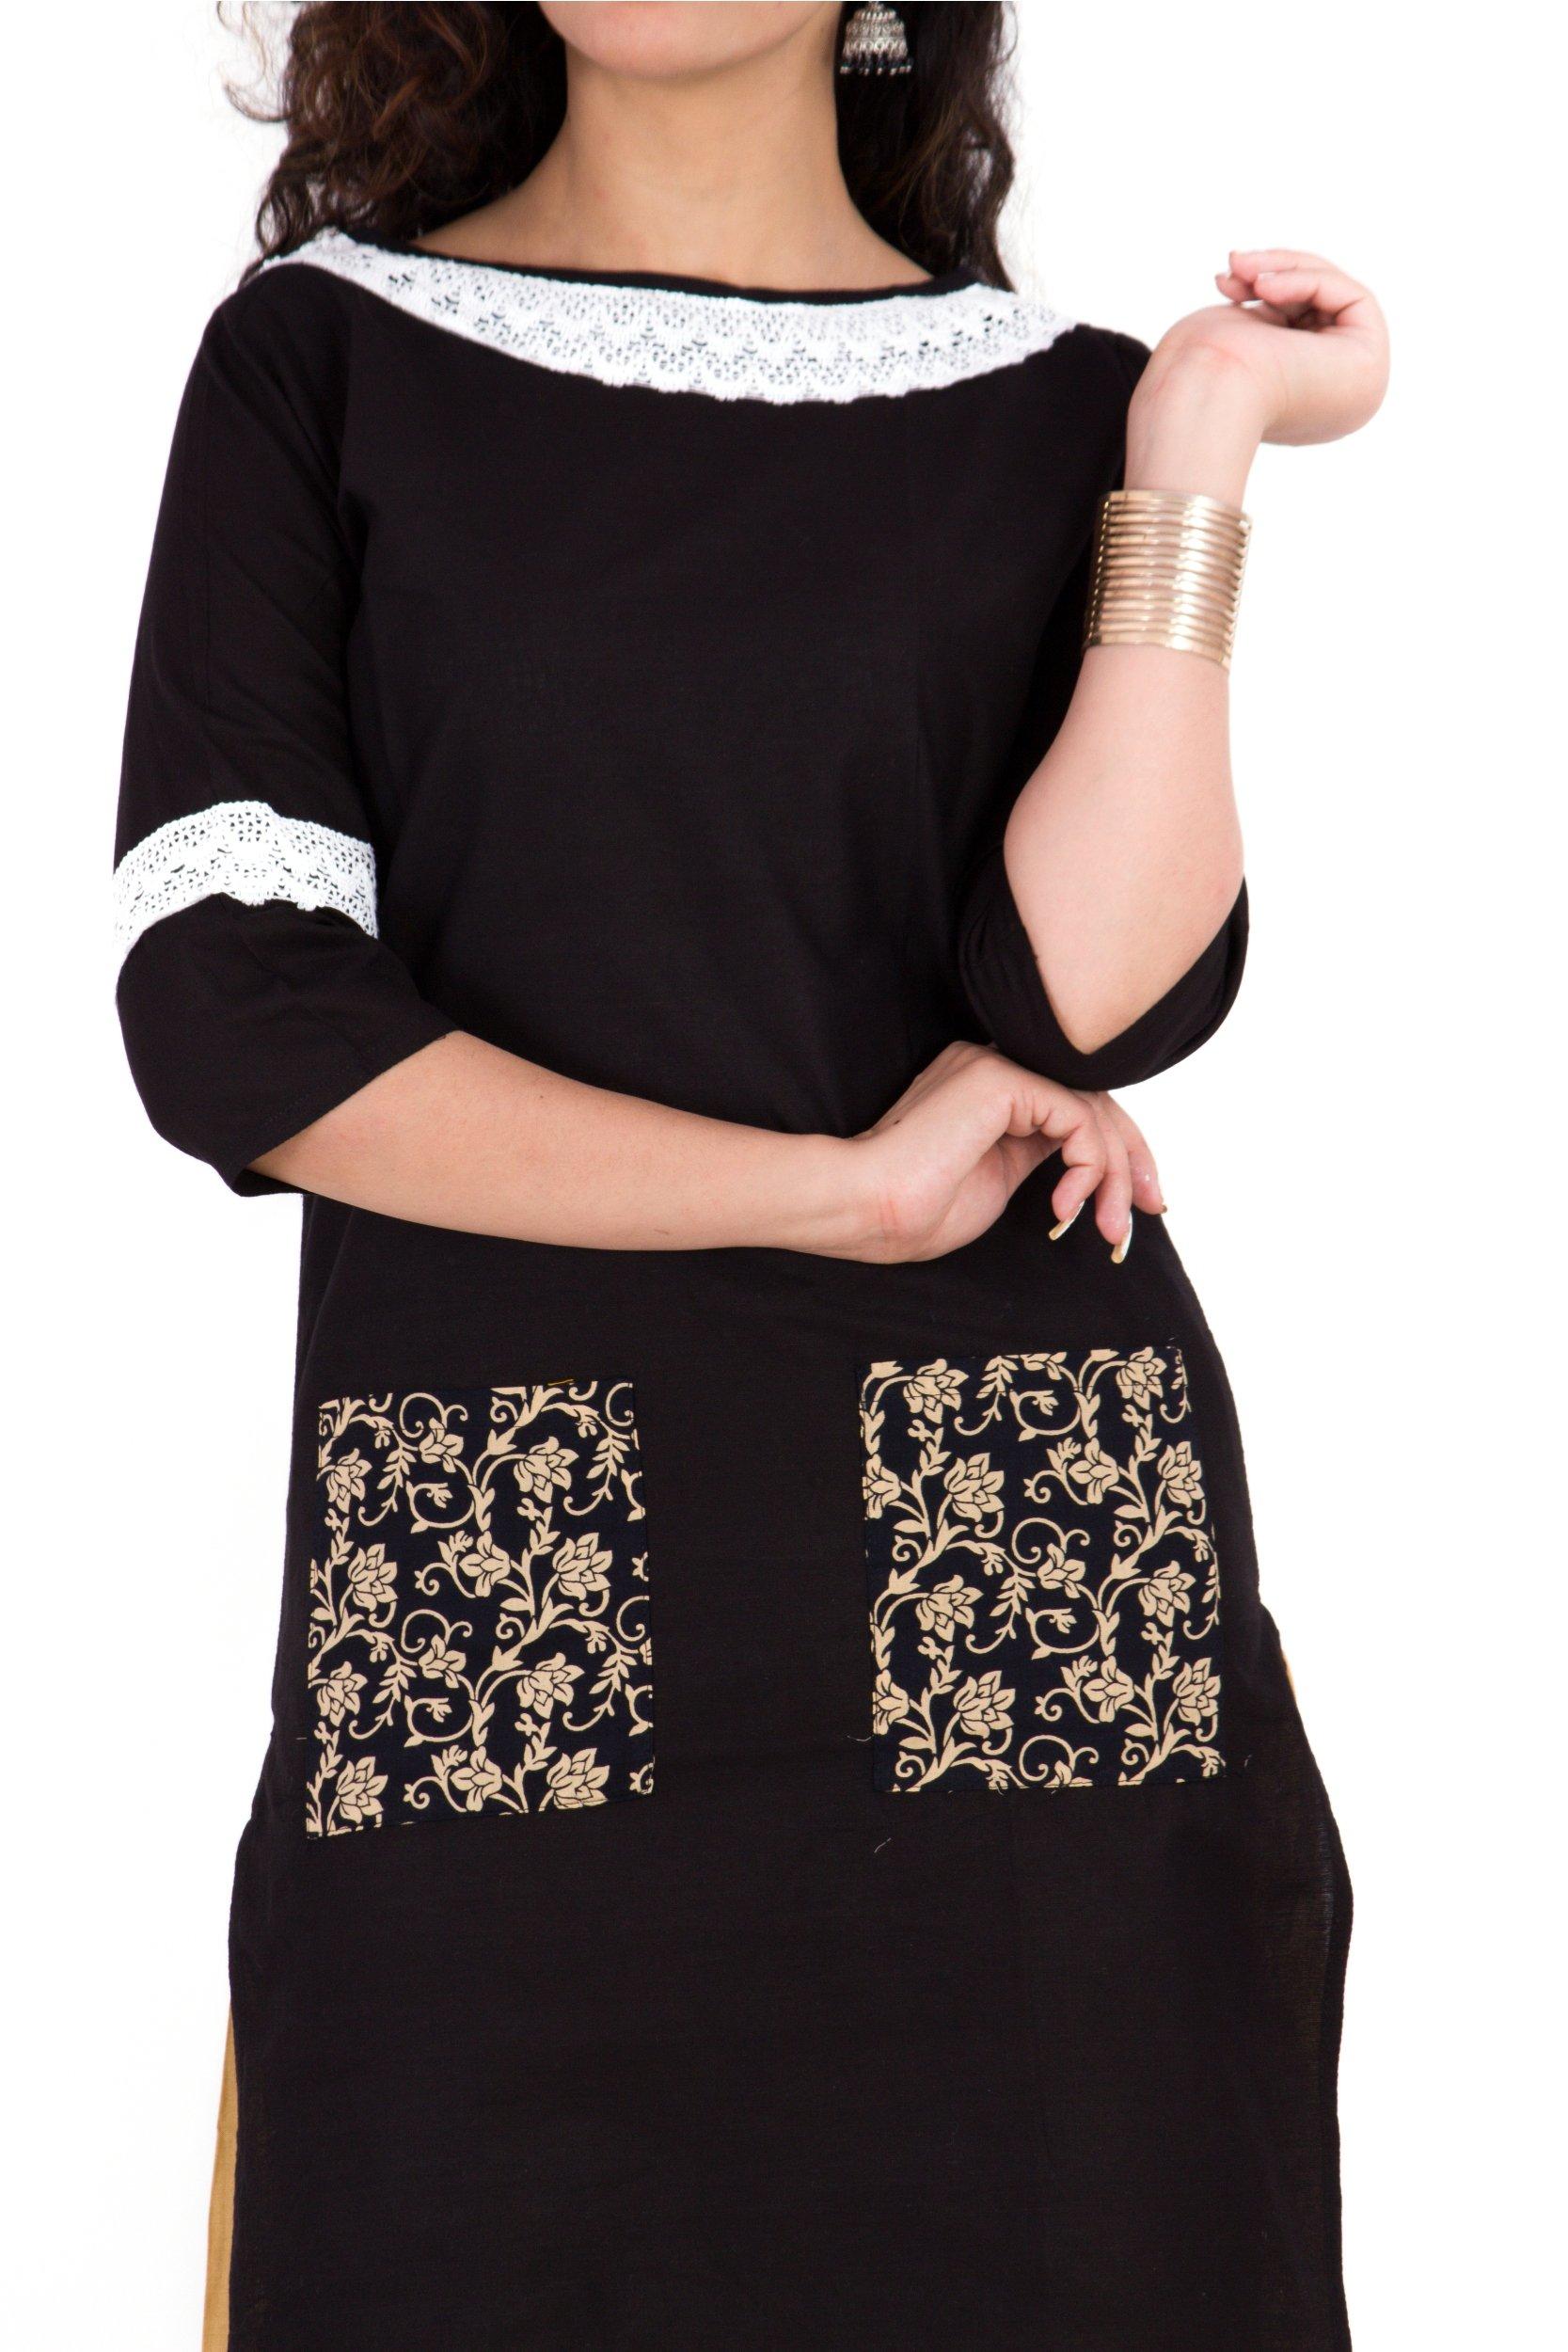 BrightJet Designer Black Cotton Lacework Women Fashion Kurti A-line Kurta Top Tunic with Rayon Solid Beige Plazzo Set Party Dress Casual (XXL) by BrightJet (Image #4)